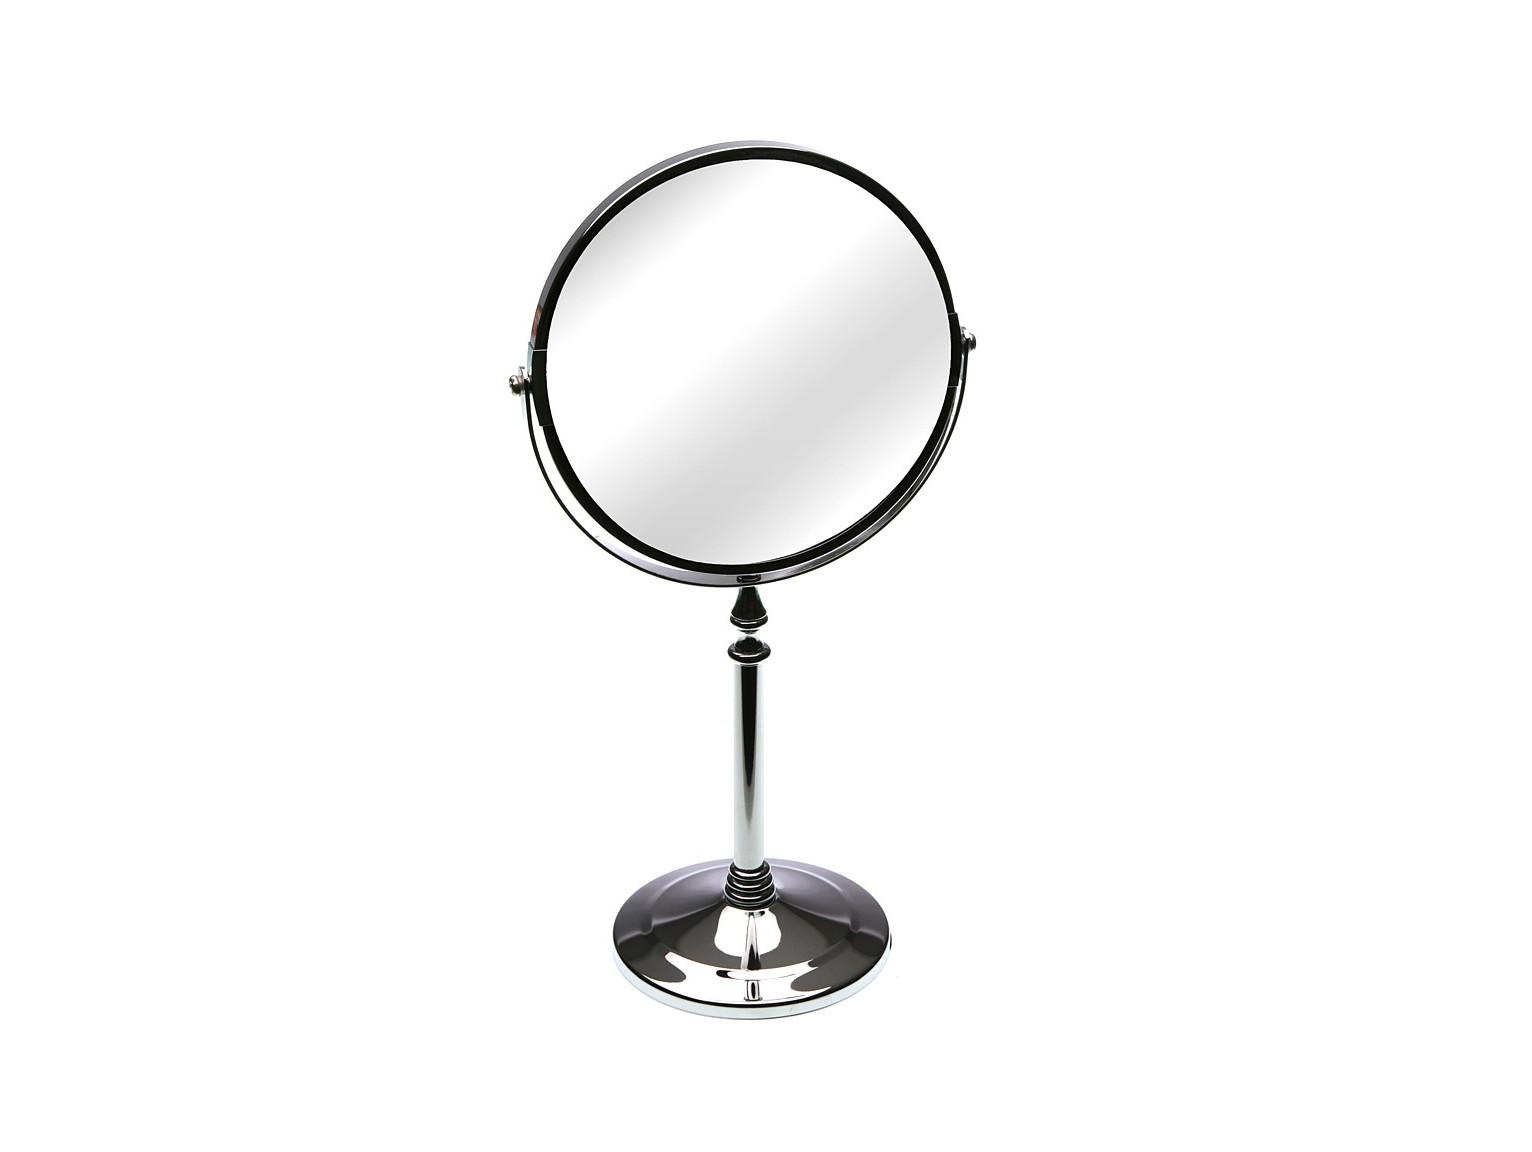 Настольное зеркалоНастольные зеркала<br><br><br>Material: Металл<br>Ширина см: 18.5<br>Высота см: 32<br>Глубина см: 12